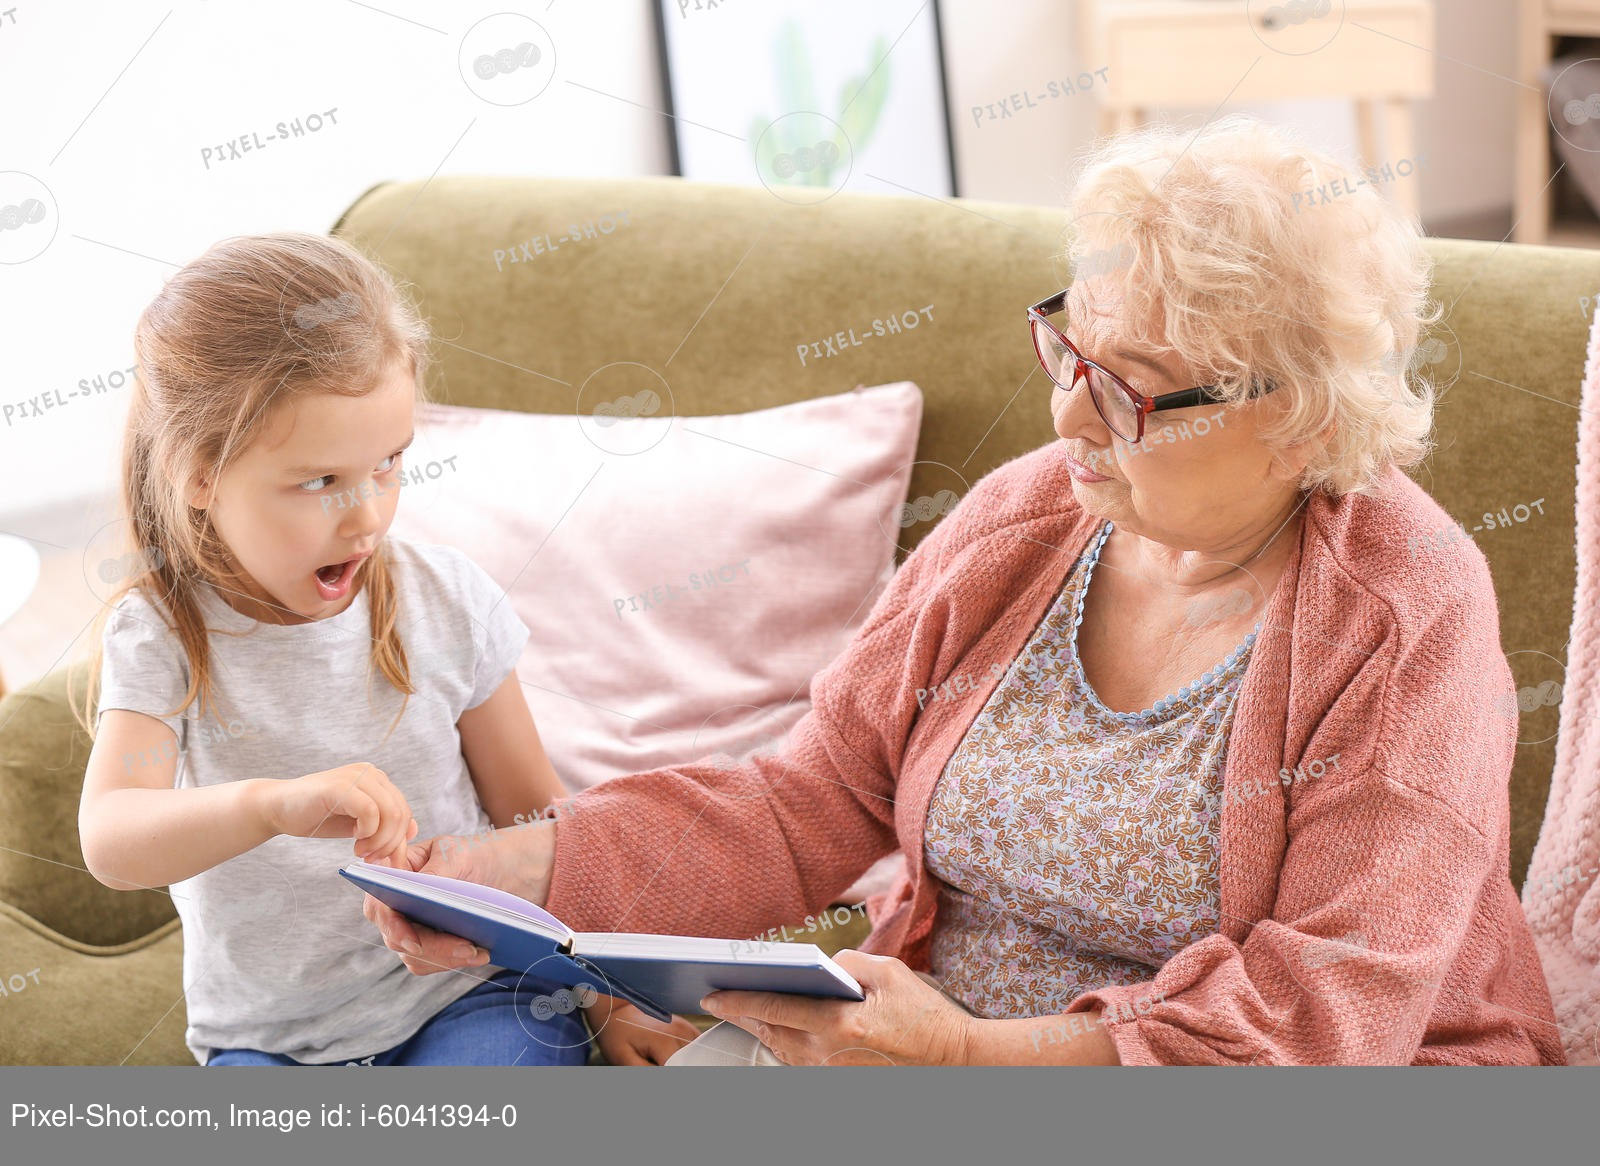 Мама – на работу, ребенка – к бабушке. это травма для ребенка?